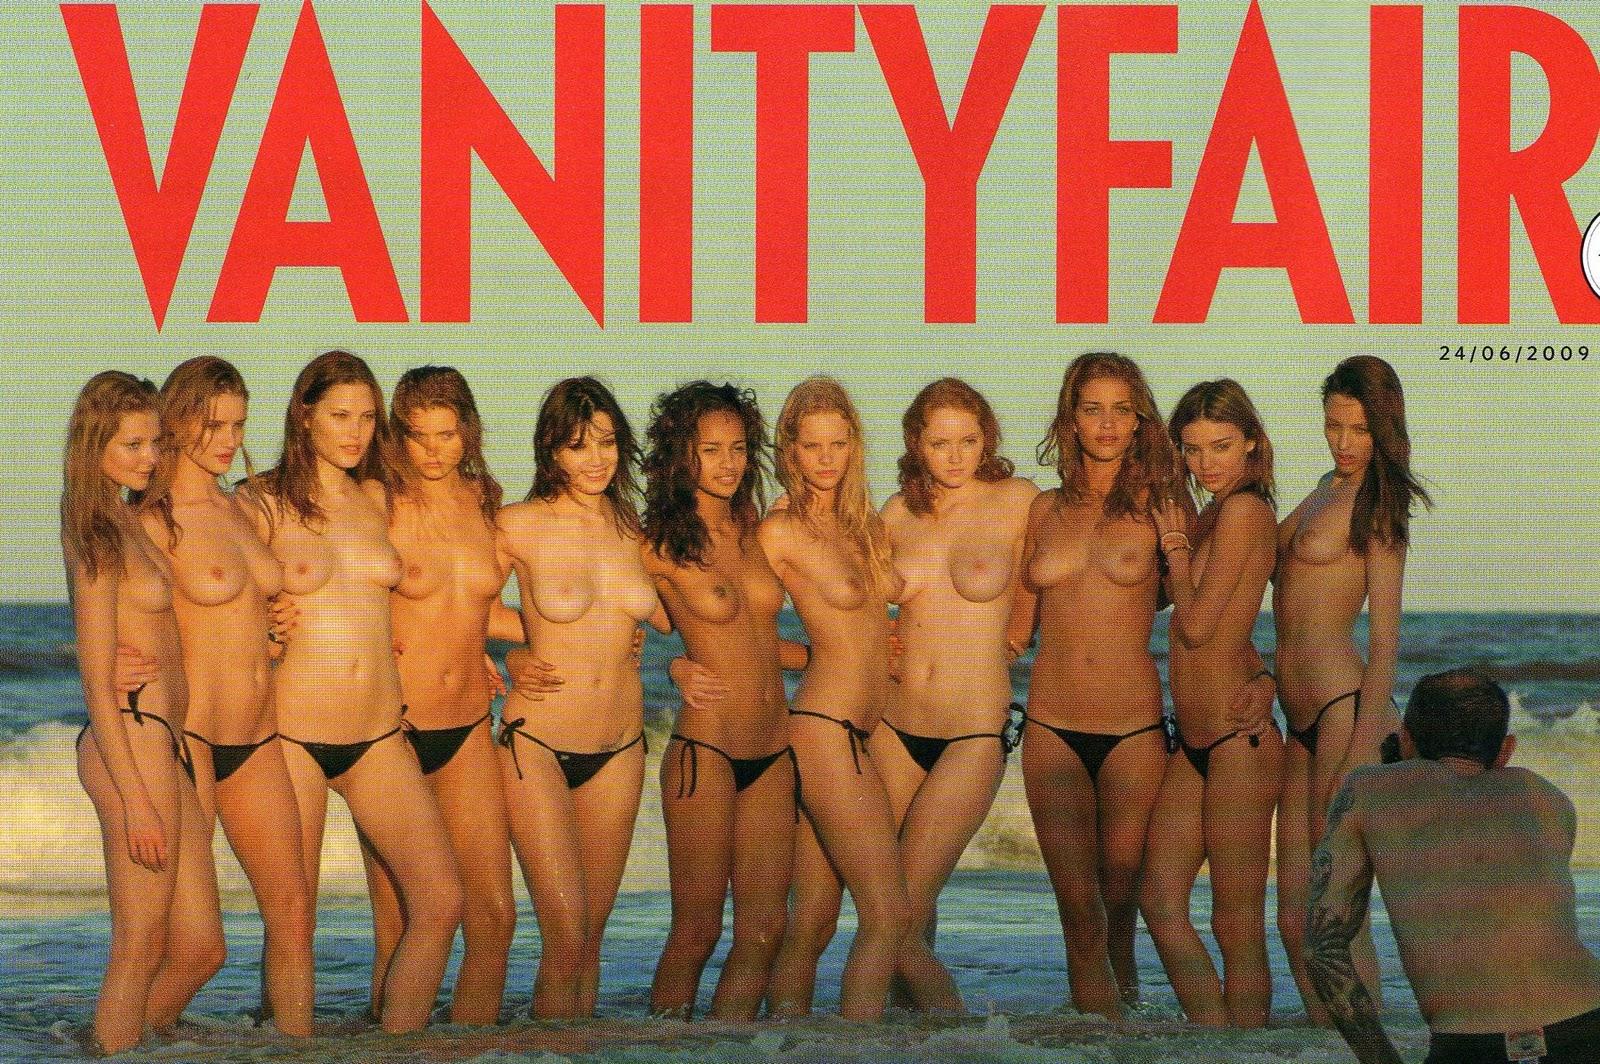 http://3.bp.blogspot.com/_WDCWEjl45FQ/TPXPPtWTidI/AAAAAAAABHI/EBIZq7w3Fc4/s1600/calendario-pirelli-nude-cover.jpg